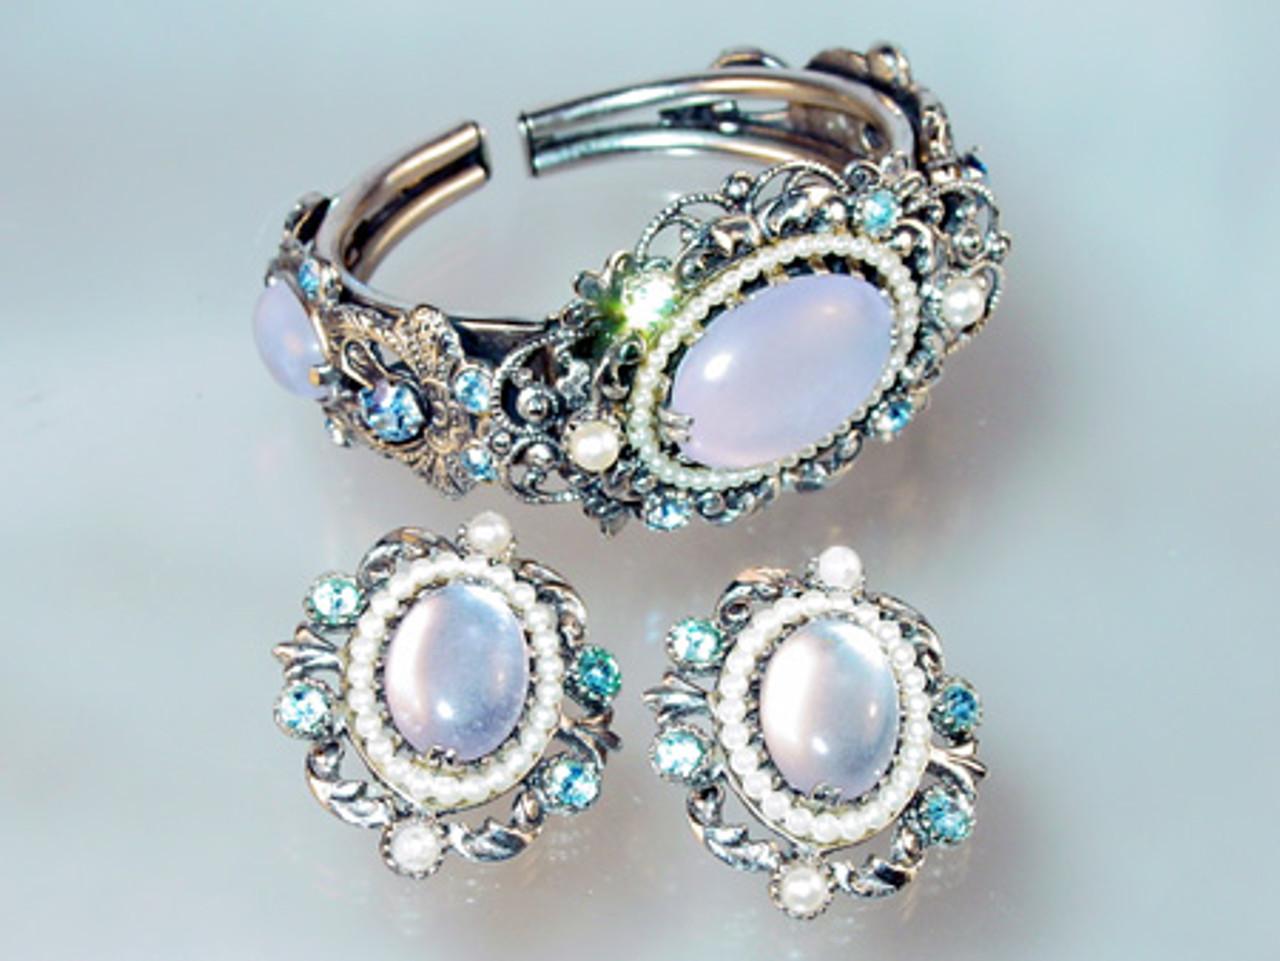 Selro corp moonstone hinged bracelet & earrings